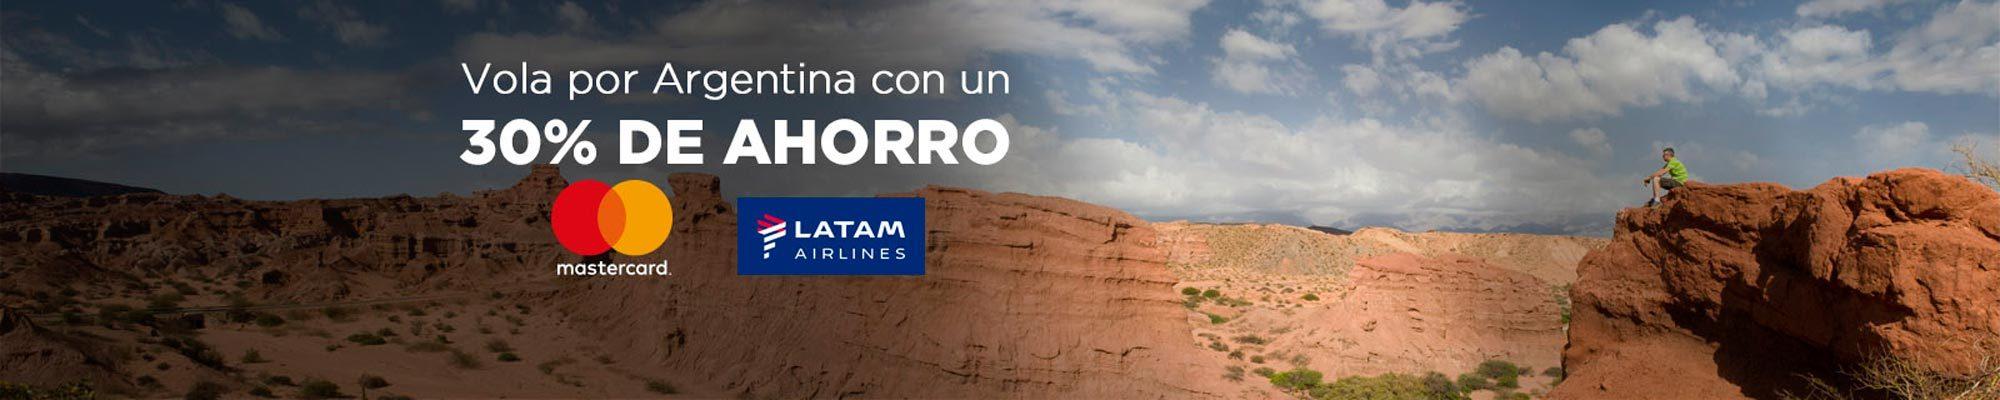 Descuento 30% con Latam para volar en Argentina con Mastercard